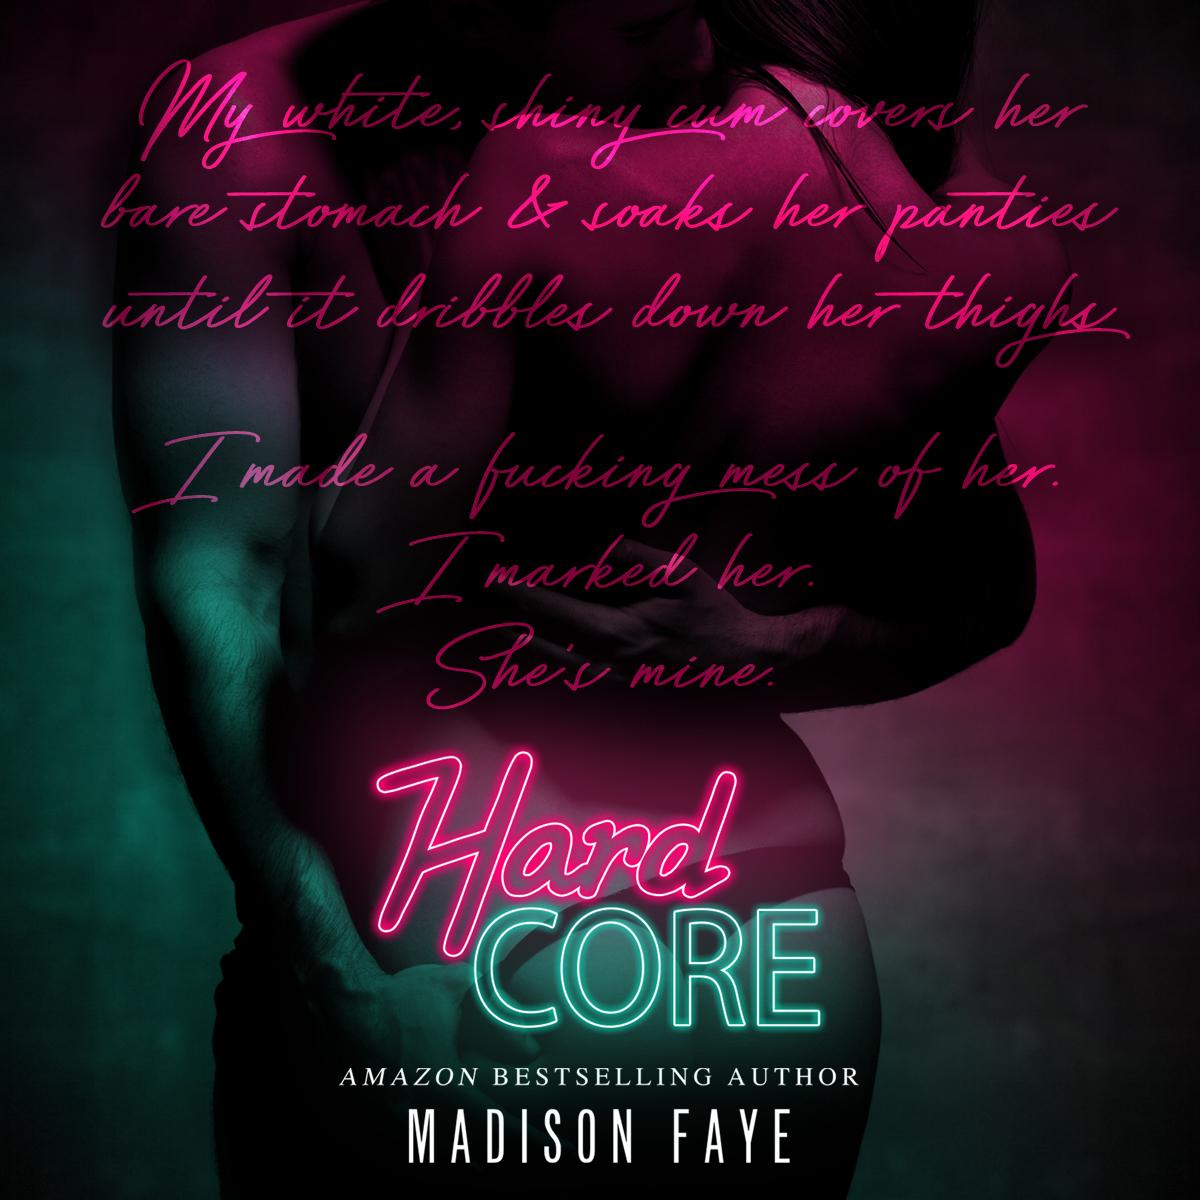 Hard-Core-Teaser-couple-2.jpg